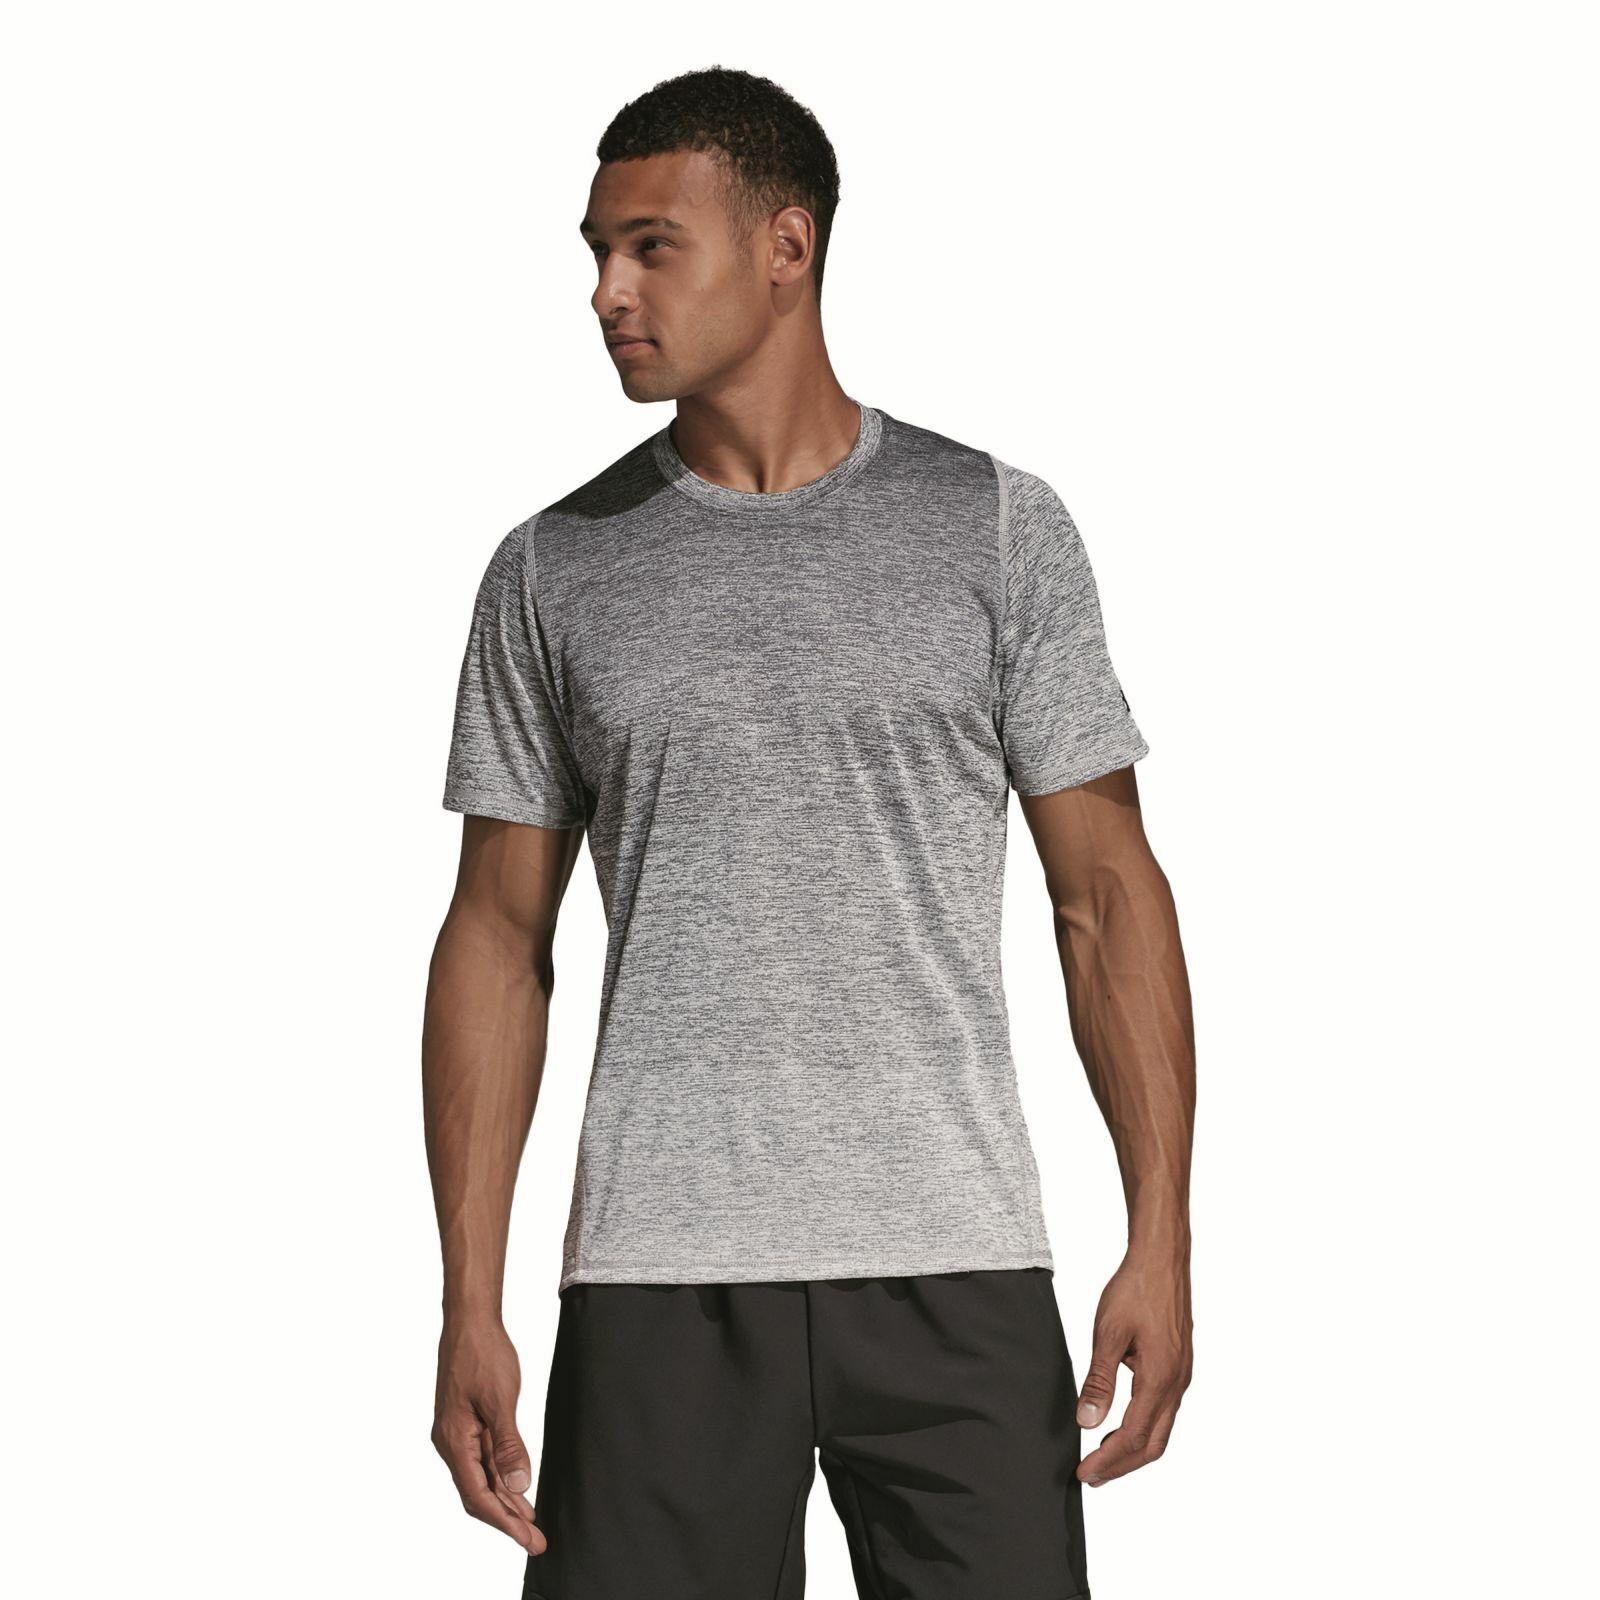 Adidas Performance Hombre Camiseta Deportiva Freelift _ 360 Degradado Gráfico